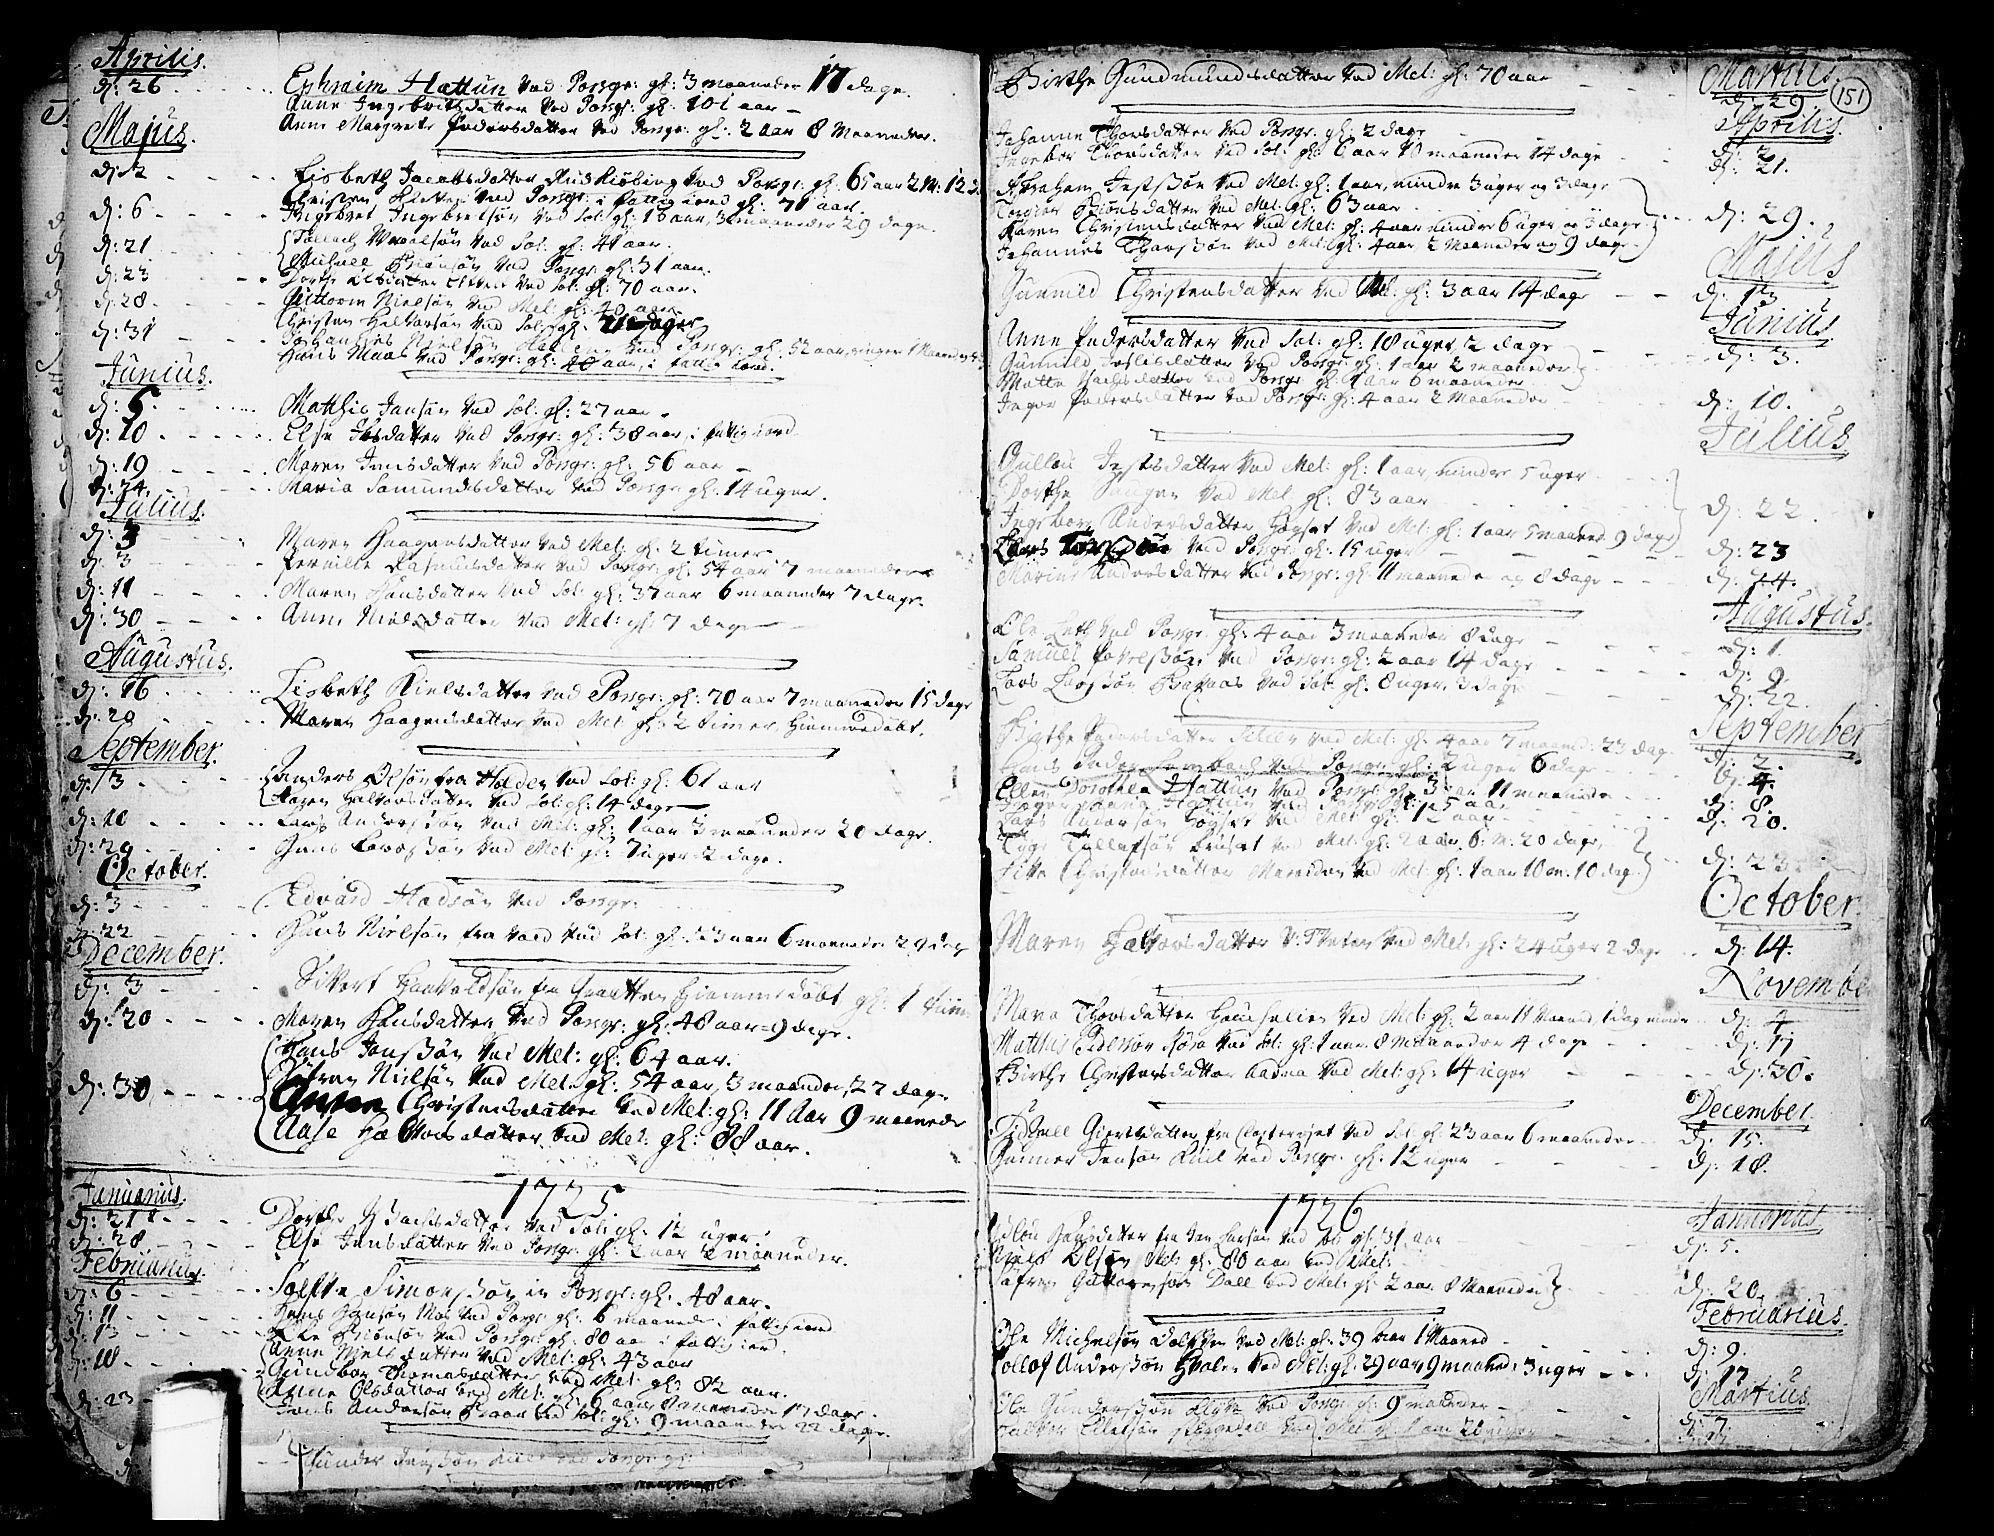 SAKO, Solum kirkebøker, F/Fa/L0002: Ministerialbok nr. I 2, 1713-1761, s. 151